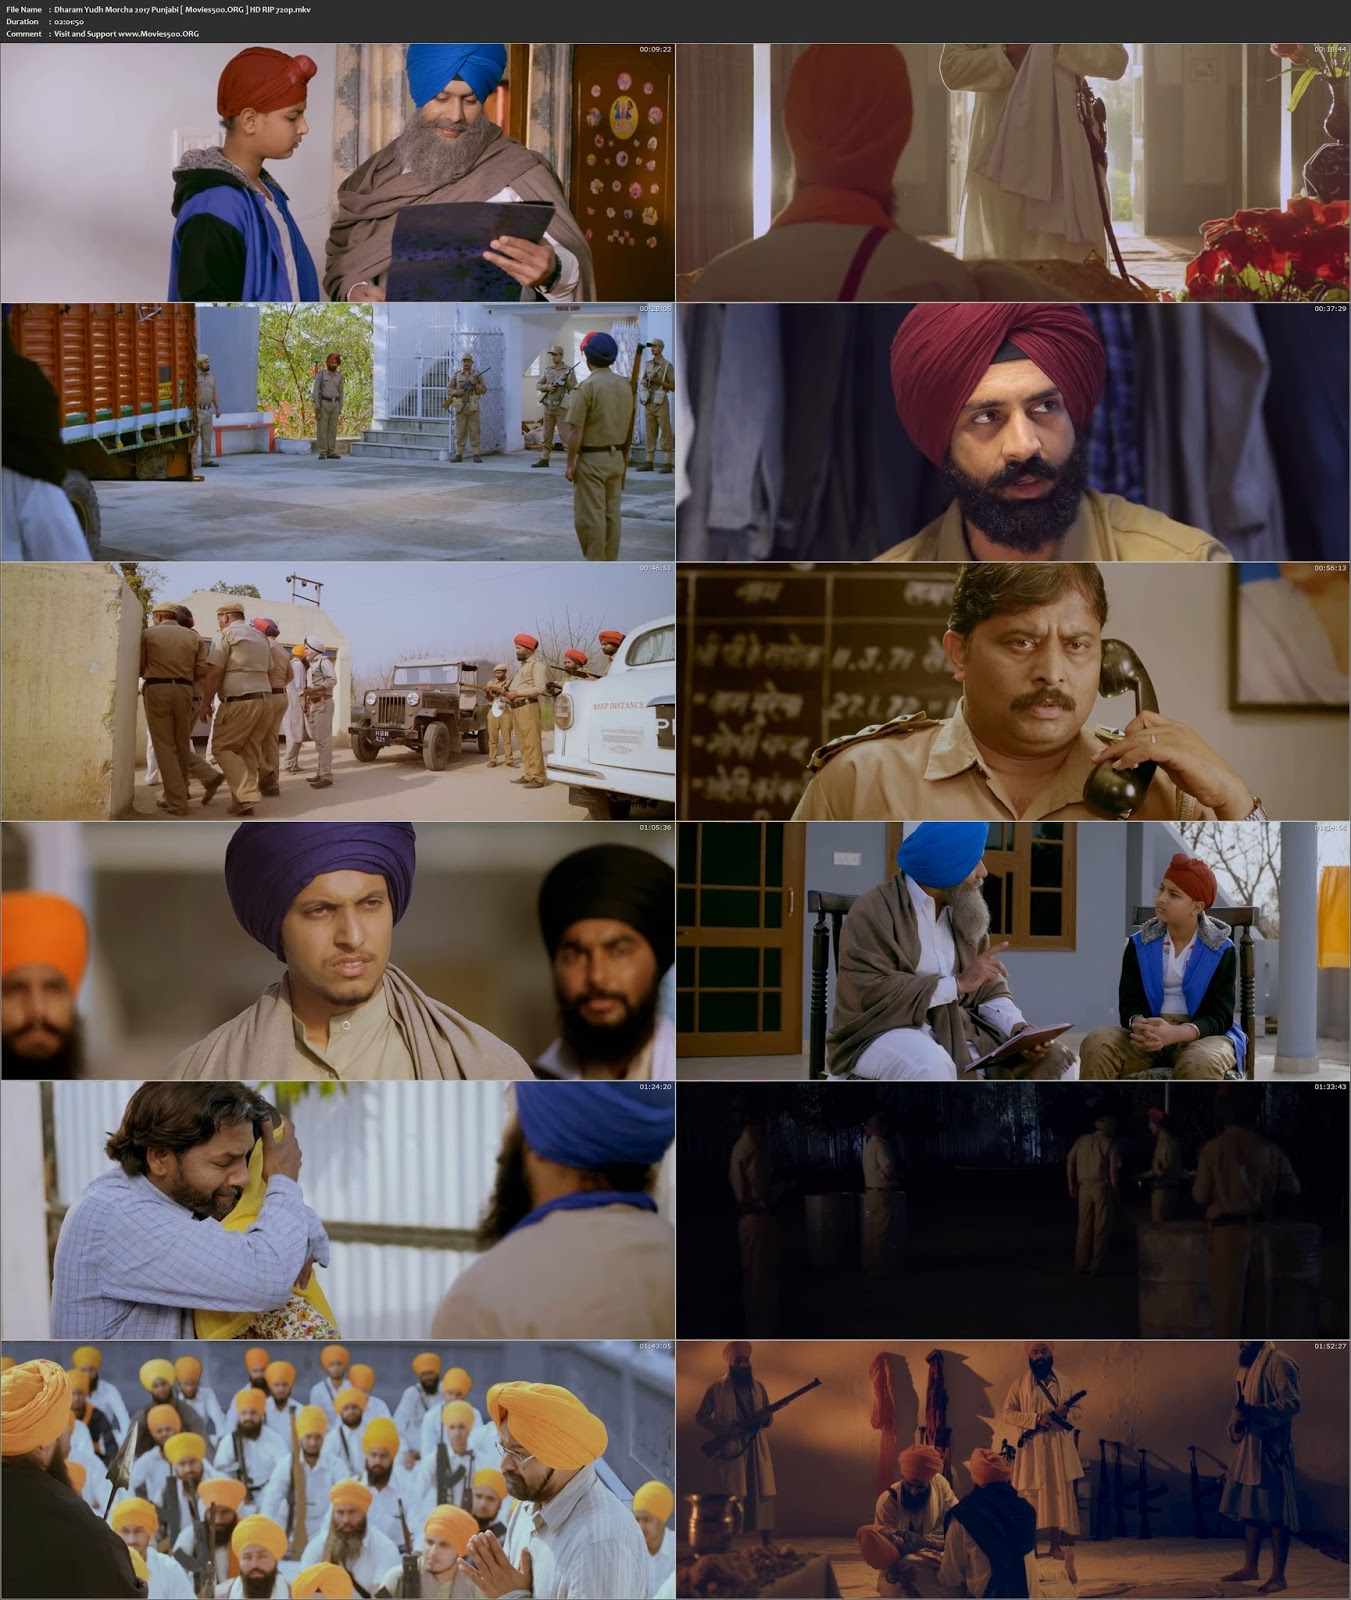 Dharam Yudh Morcha 2016 Punjabi Download HDRip 720p at xcharge.net